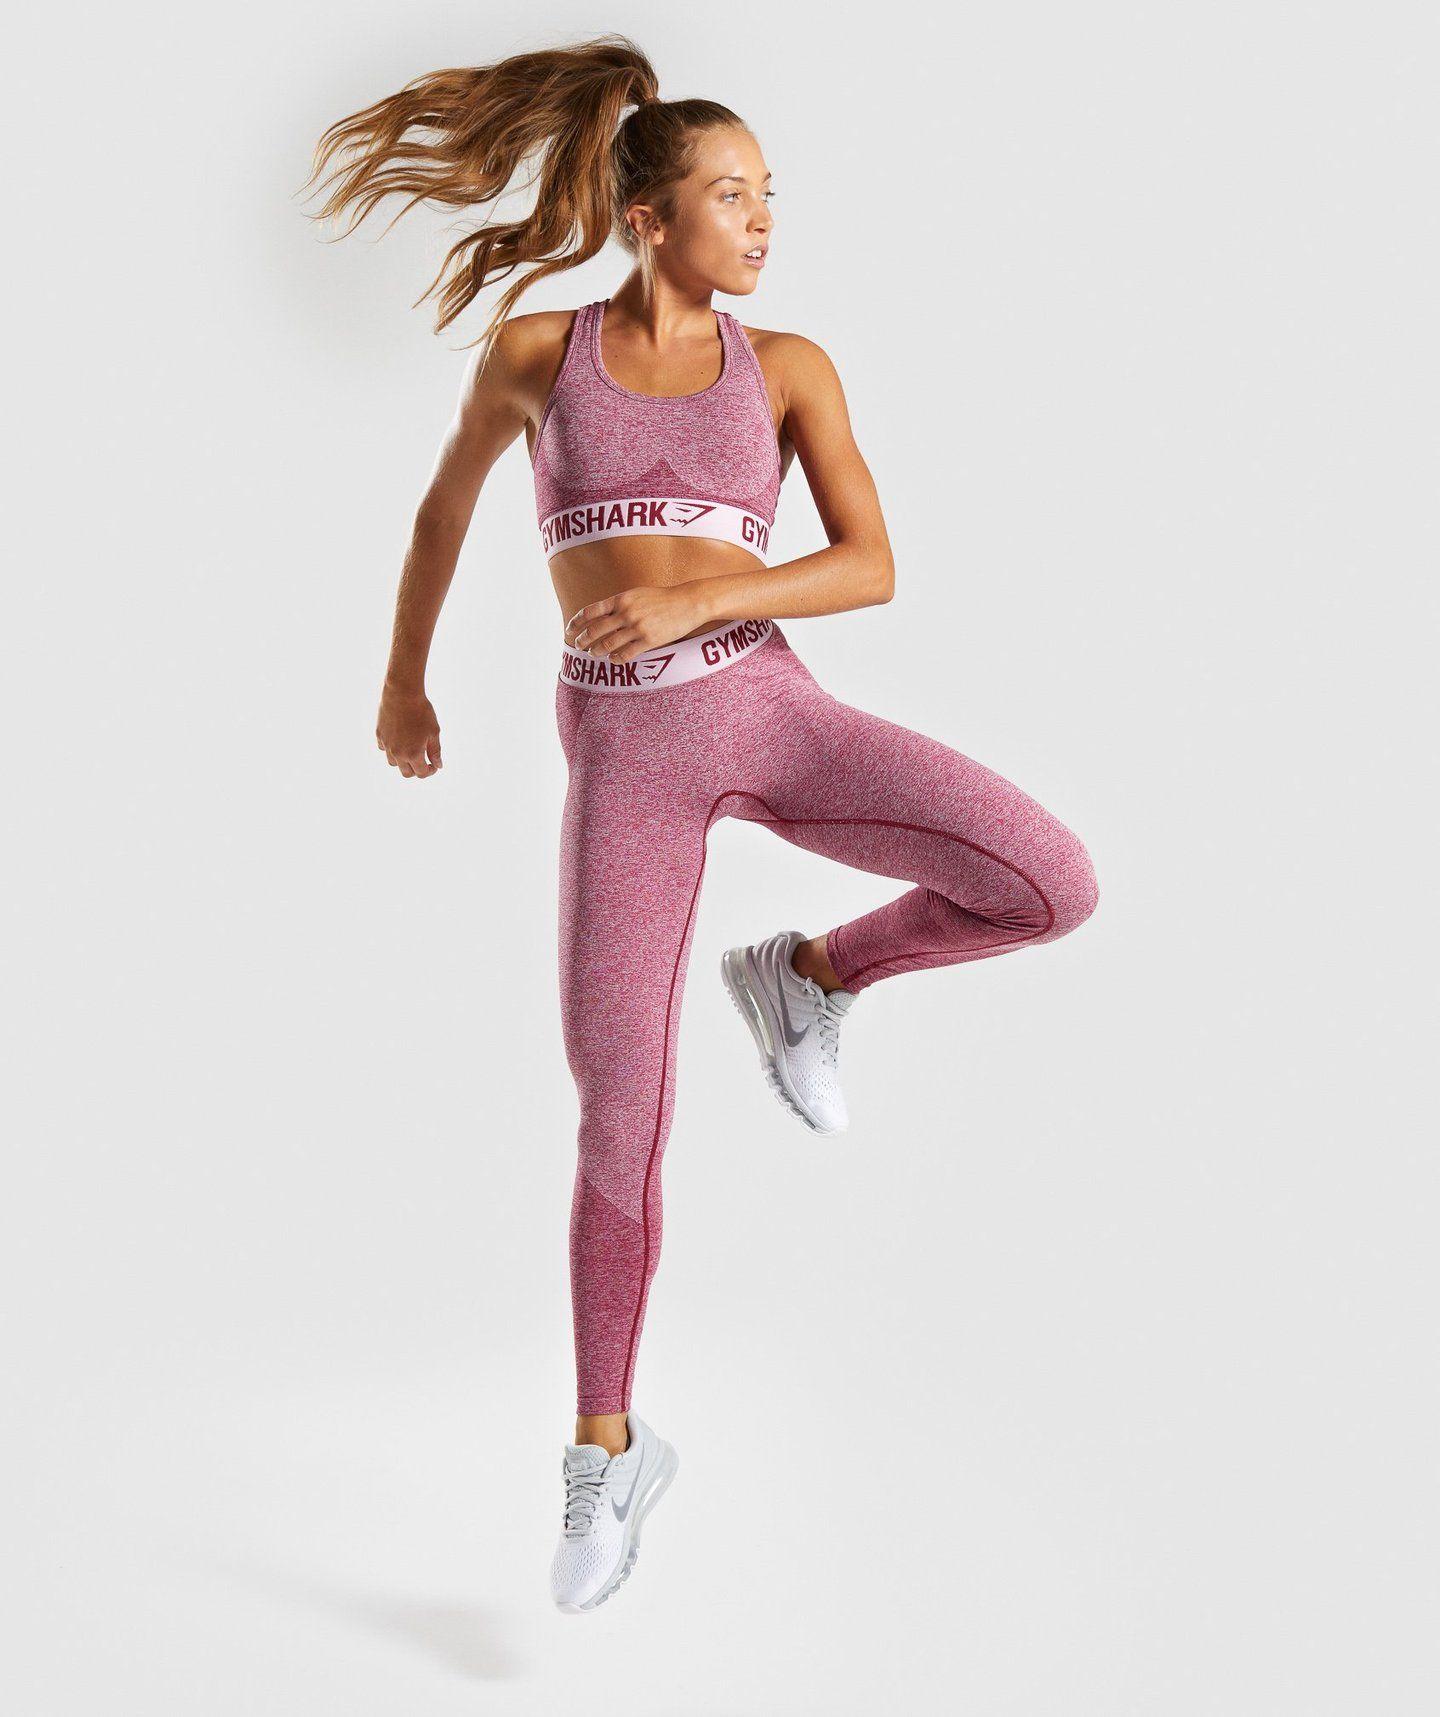 c73410490c213 Gymshark Flex Leggings - Beet Marl/Chalk Pink 3   Bras in 2019 ...